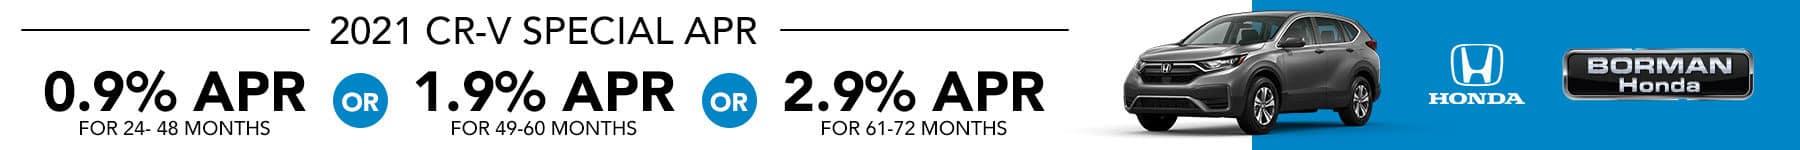 0.9% APR for 24-48 months or 1.9% for 49-60 months or 2.9% for 61-72 months